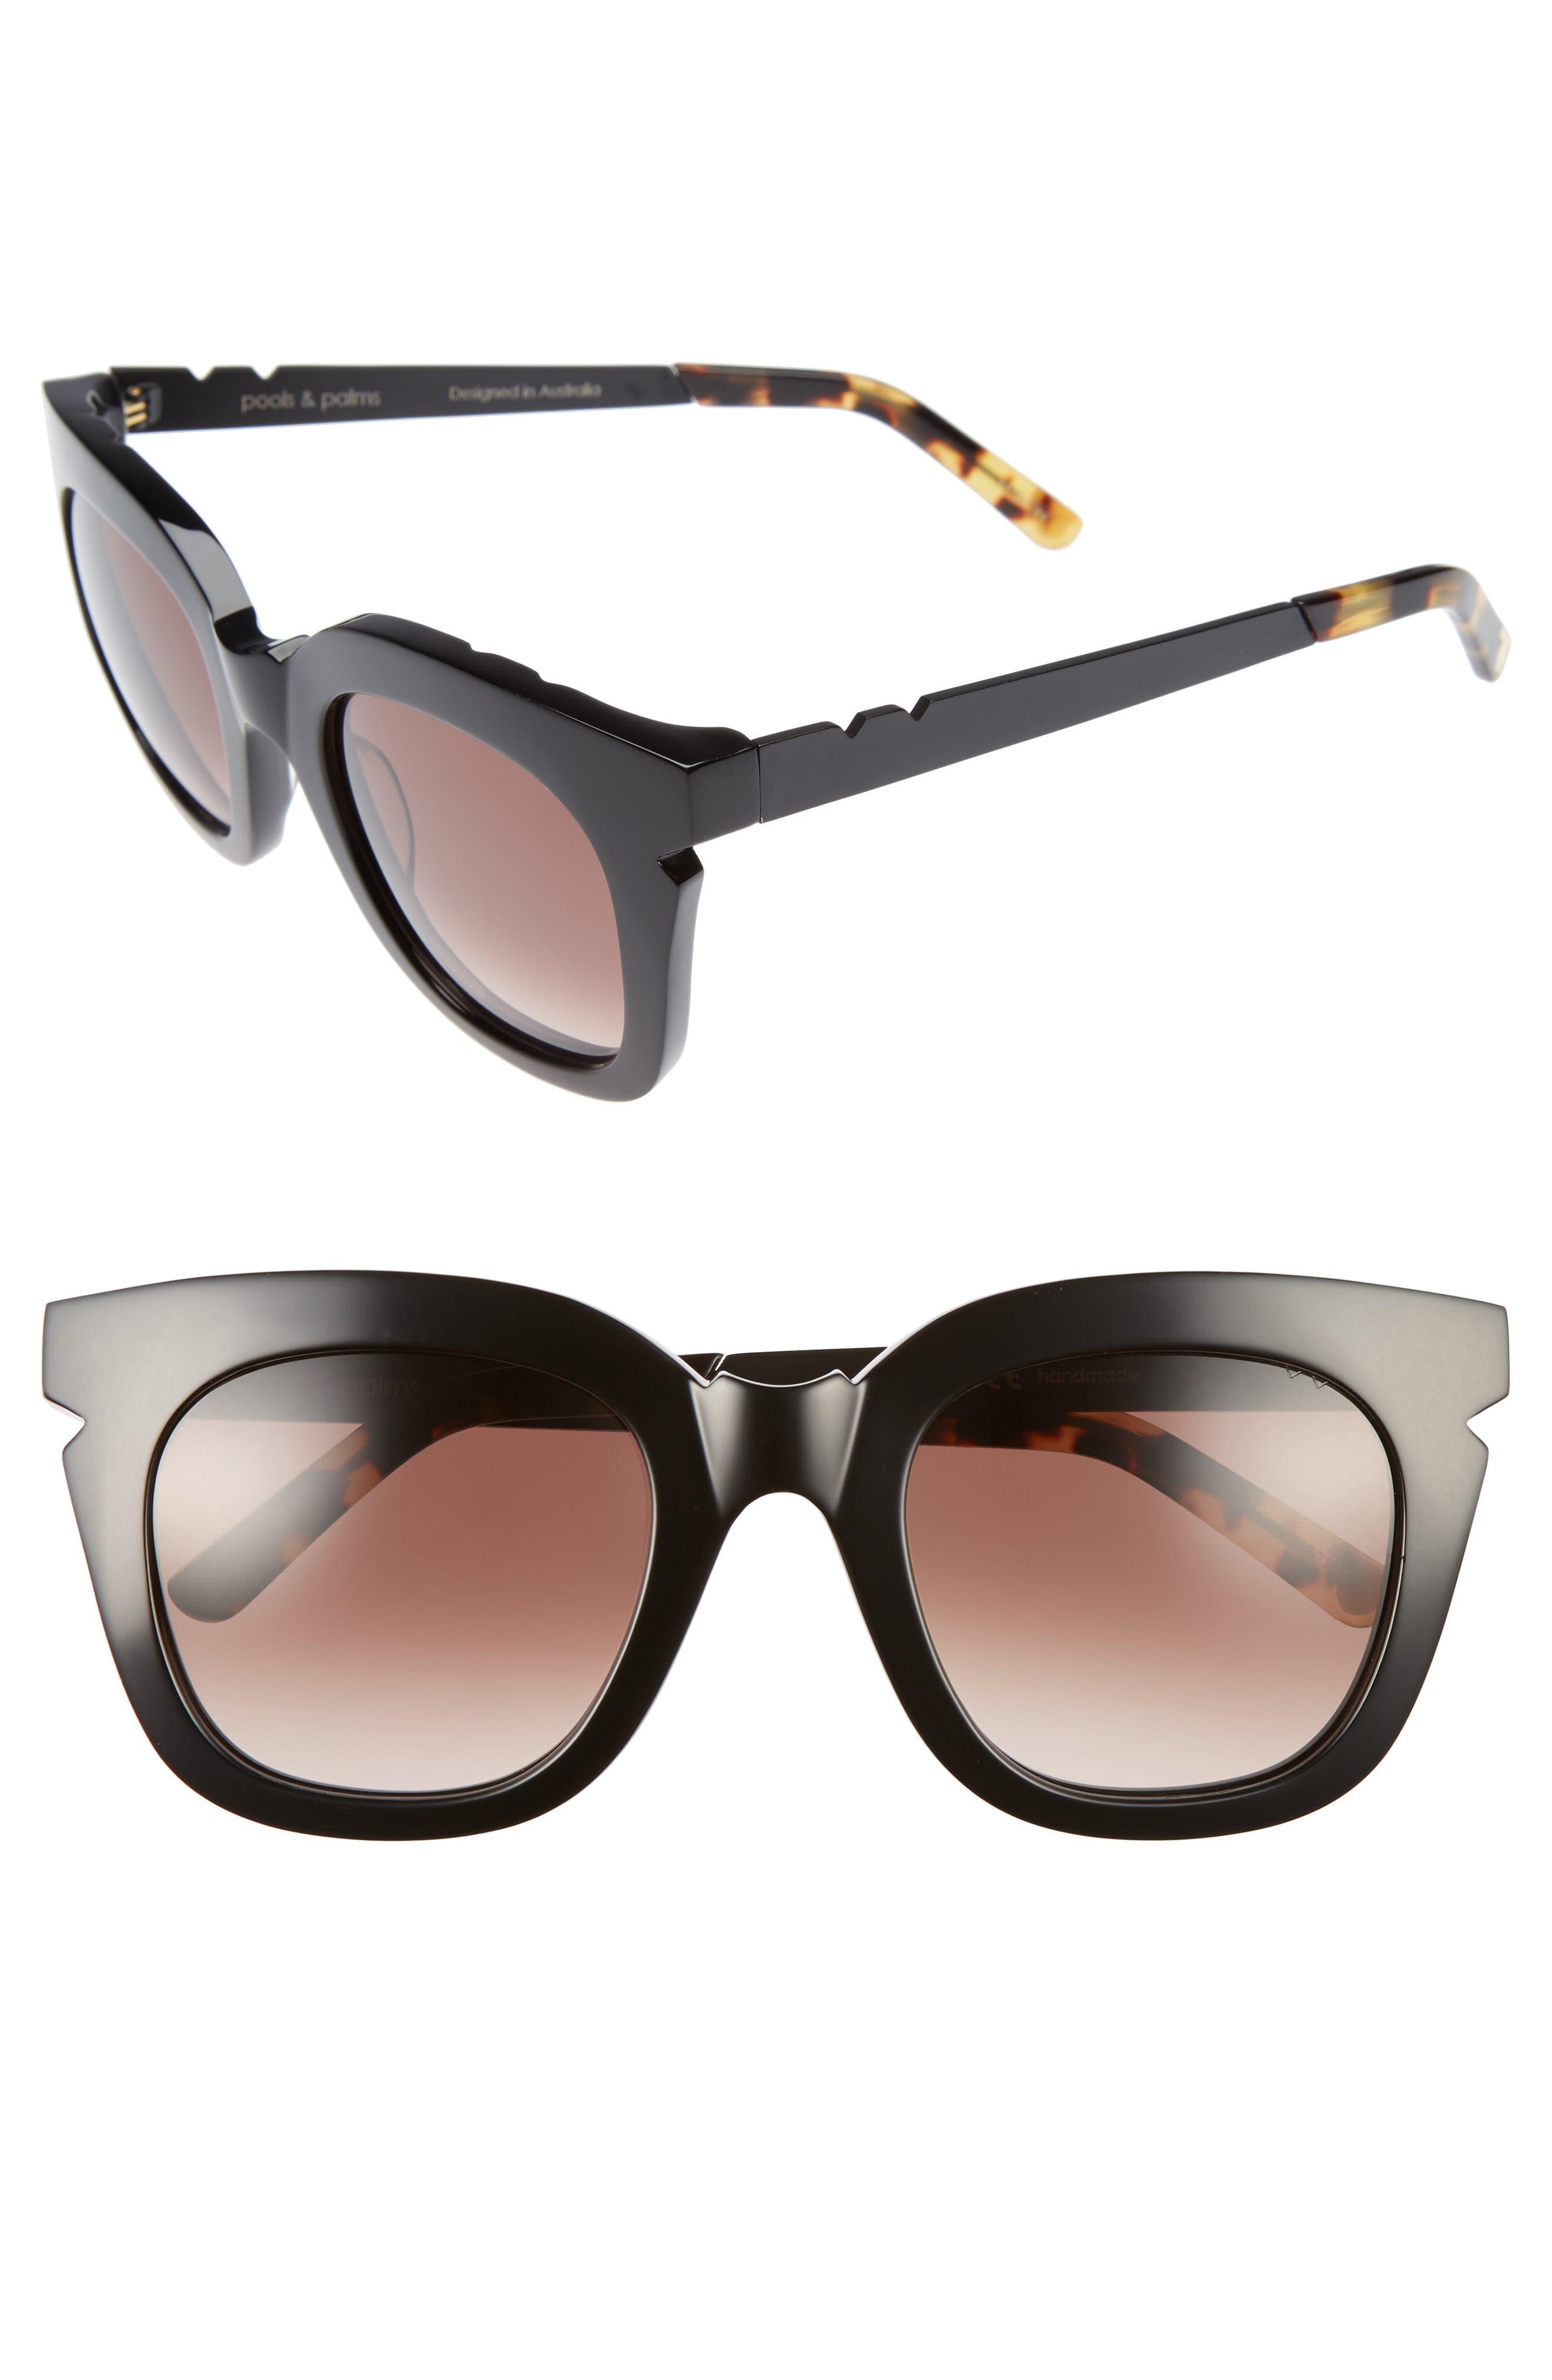 Pools & Palms 50mm Sunglasses,                             Main thumbnail 1, color,                             BLACK/ BROWN